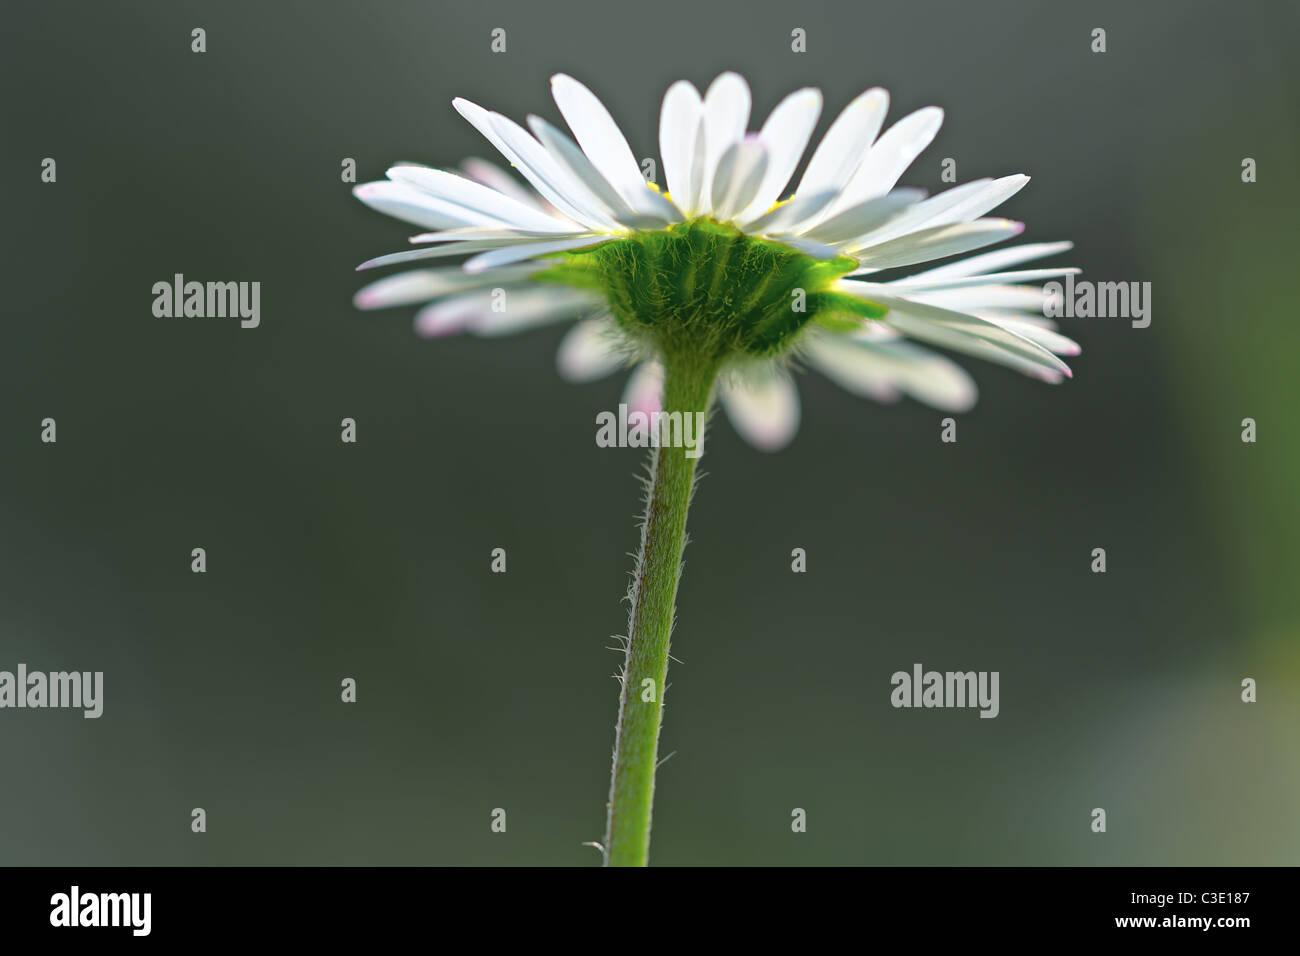 Single common daisy flowerhead from below - Stock Image